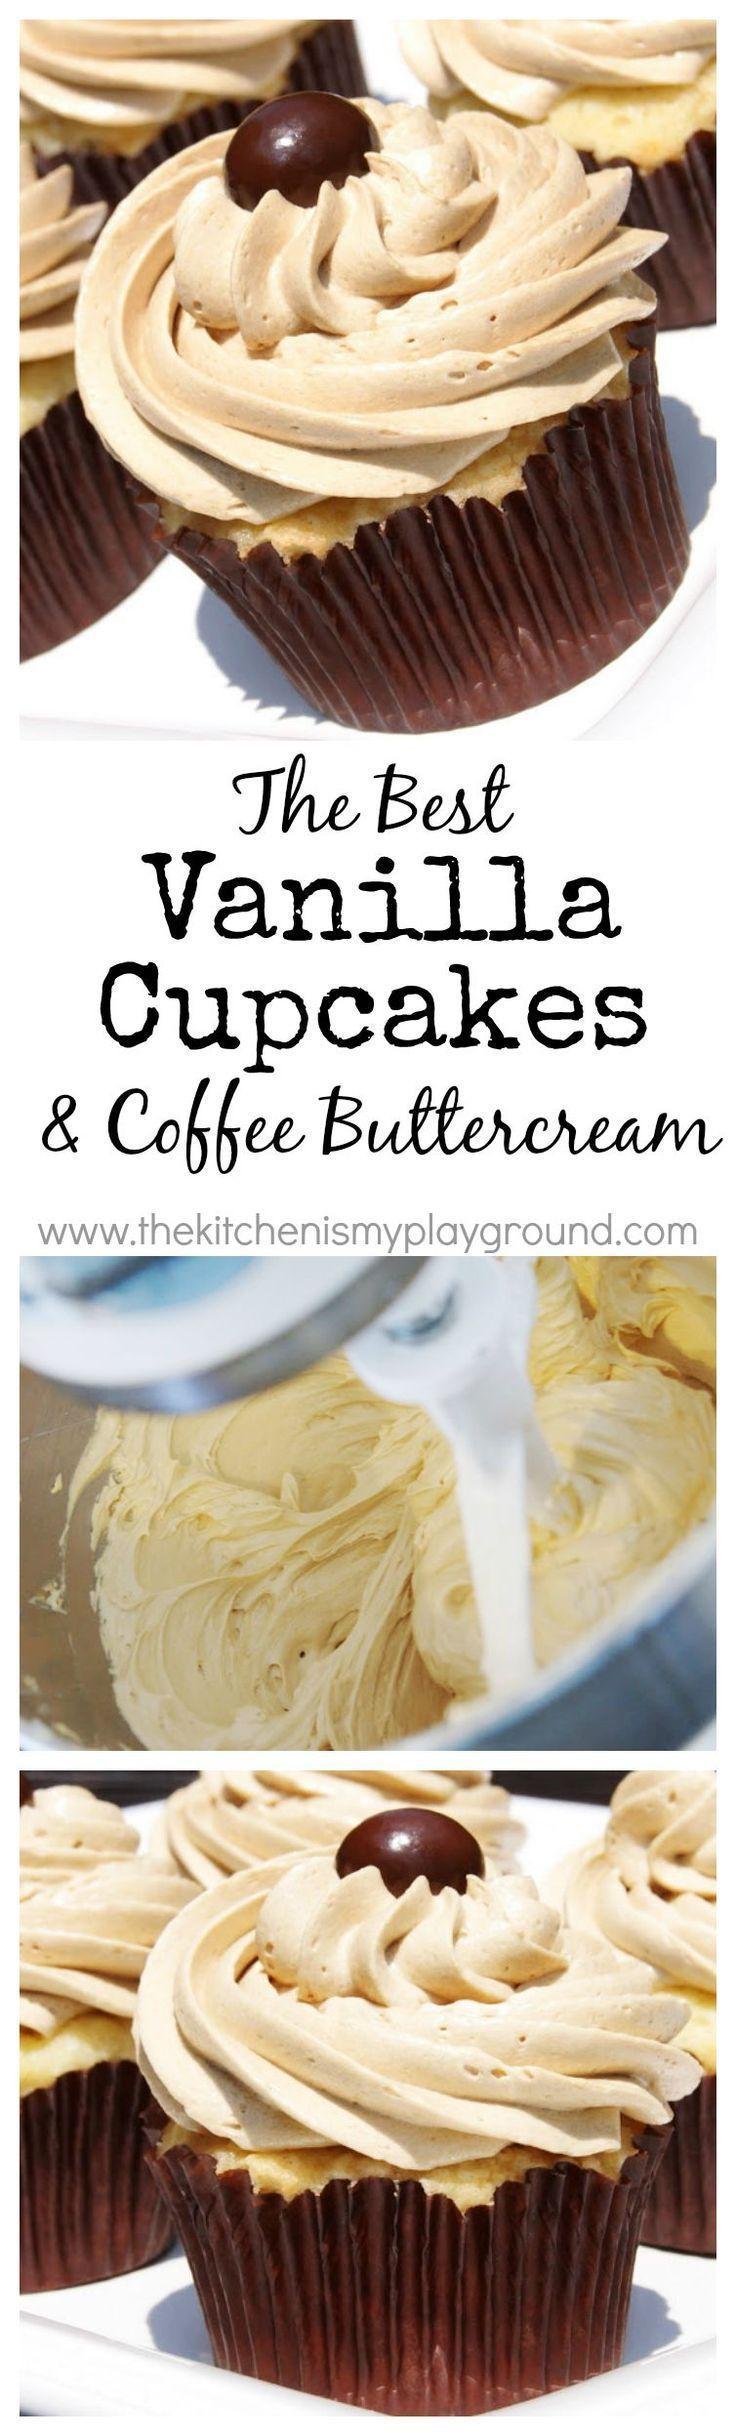 The BEST Vanilla Cupcake & the BEST Coffee Buttercream Frosting. Yum! http://www.thekitchenismyplayground.com